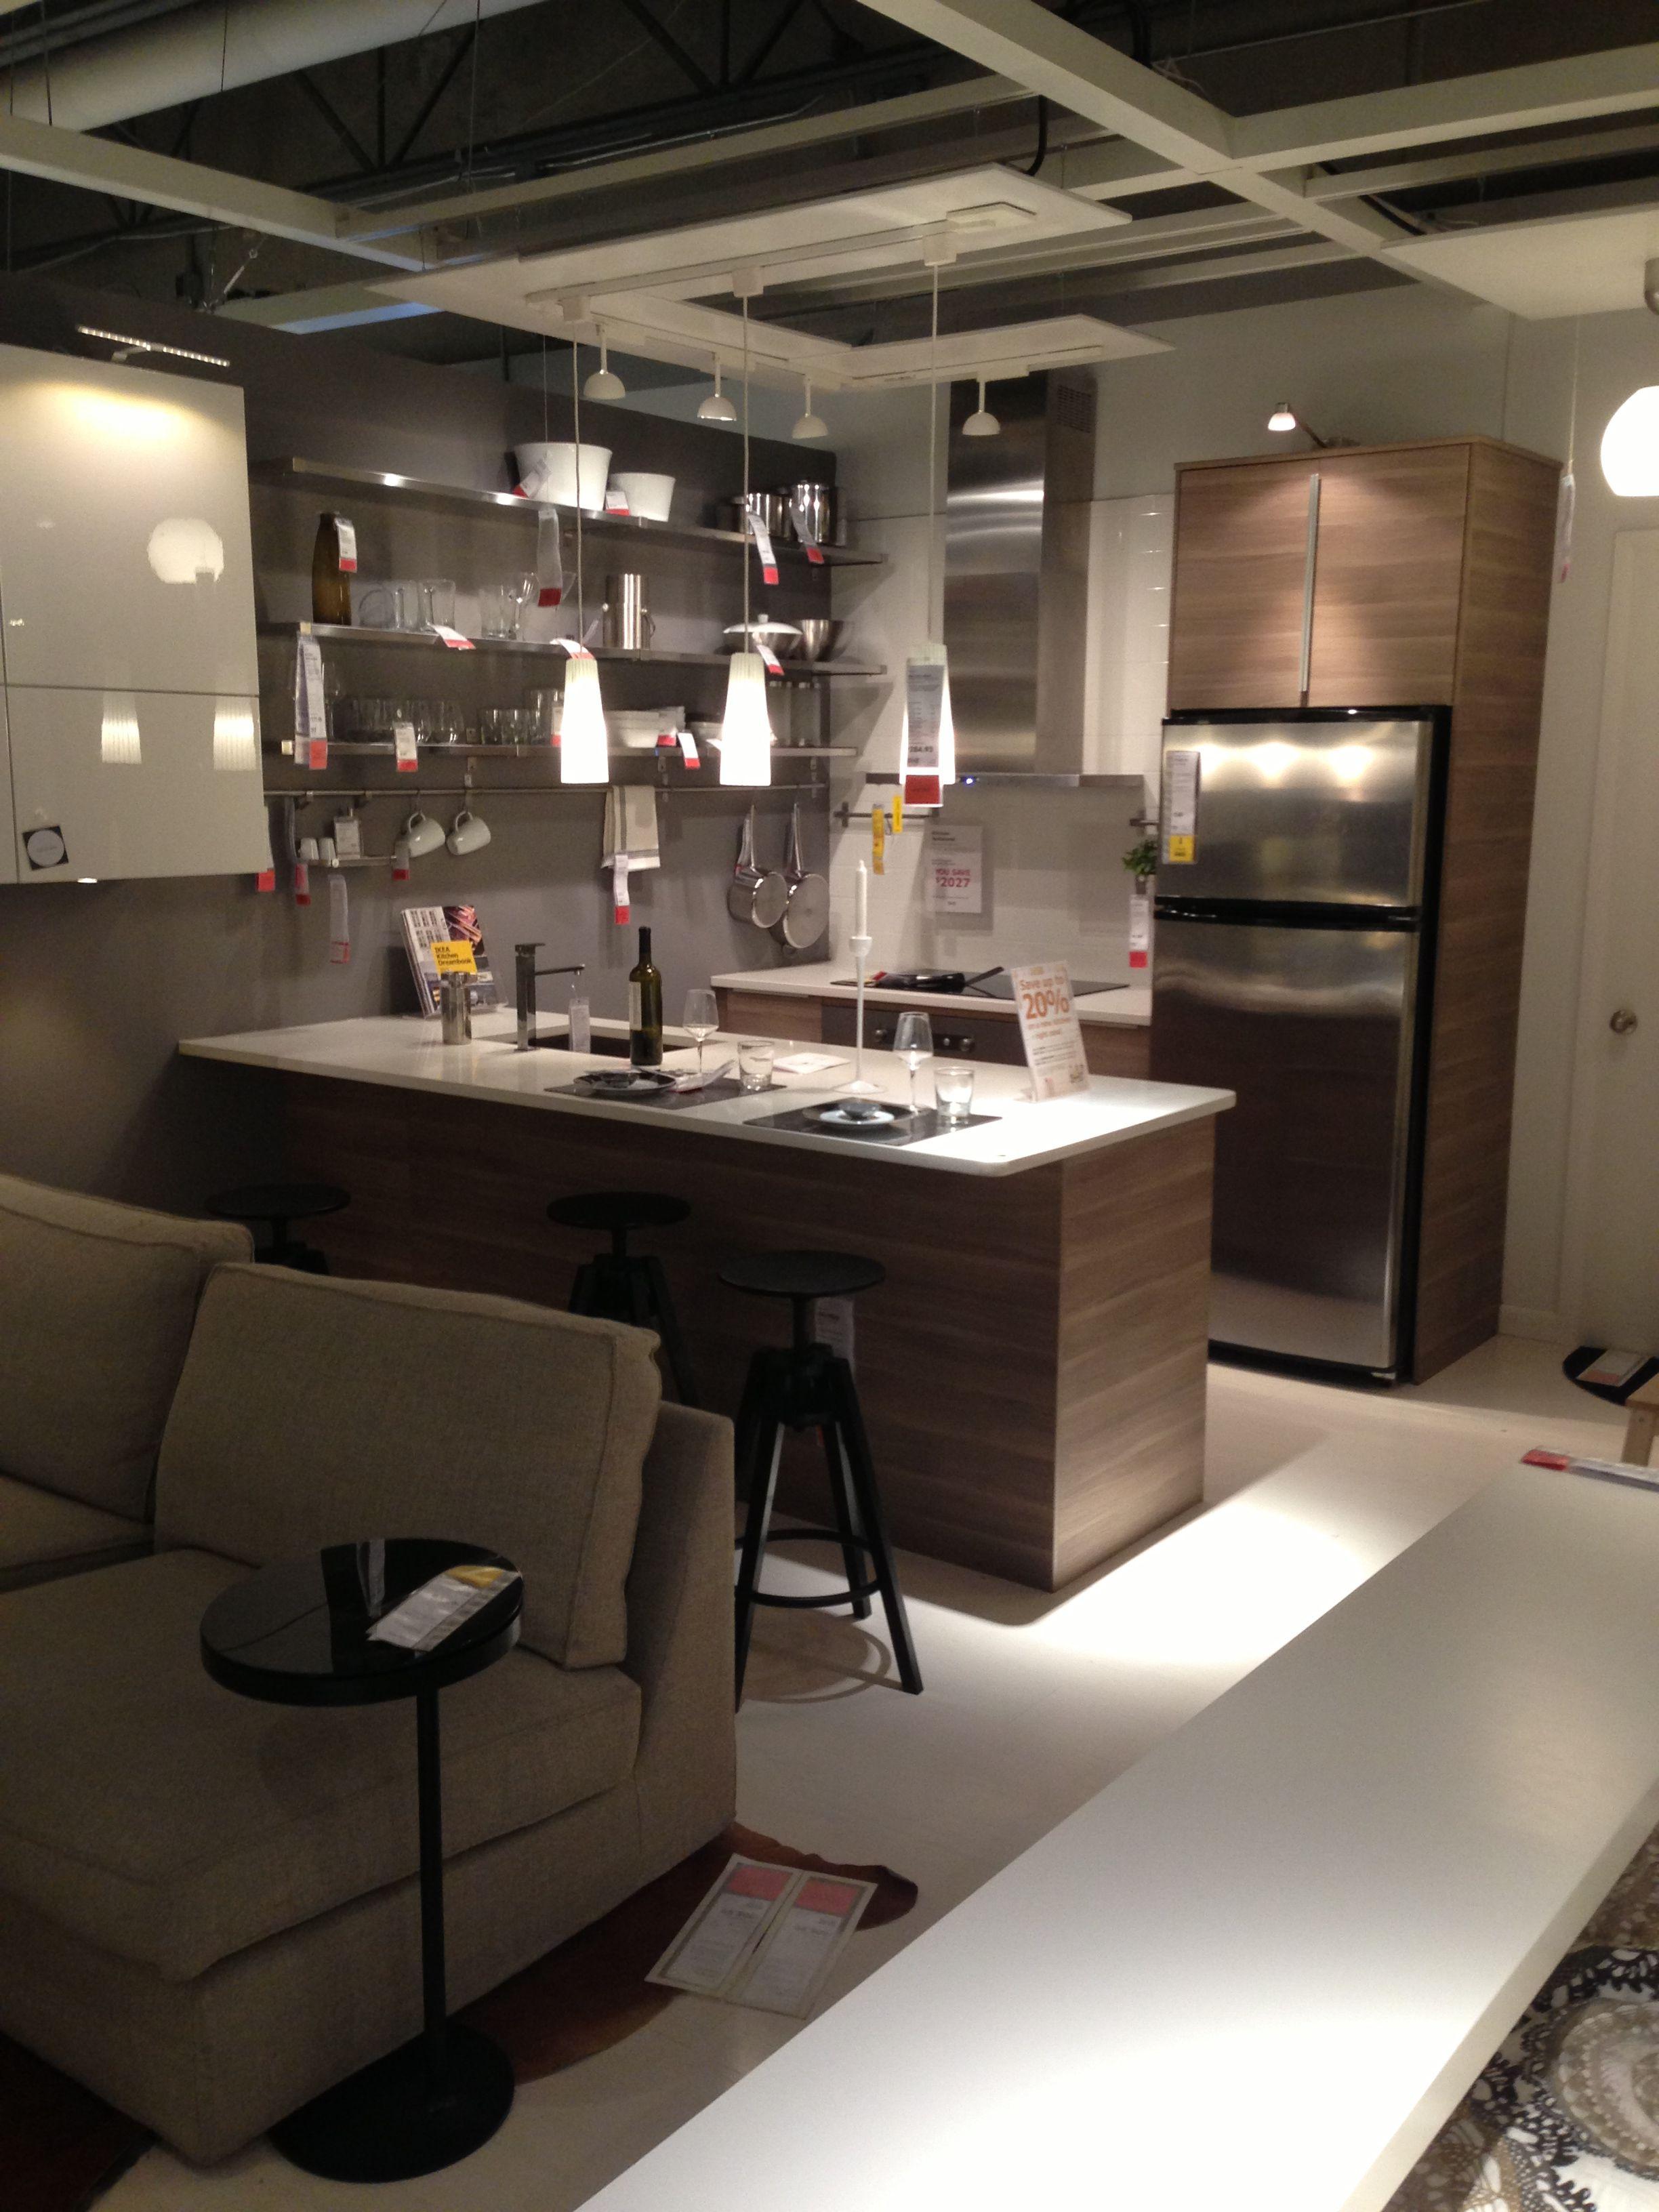 380 Sq Ft Studio Apartment Tiny houses plans with loft